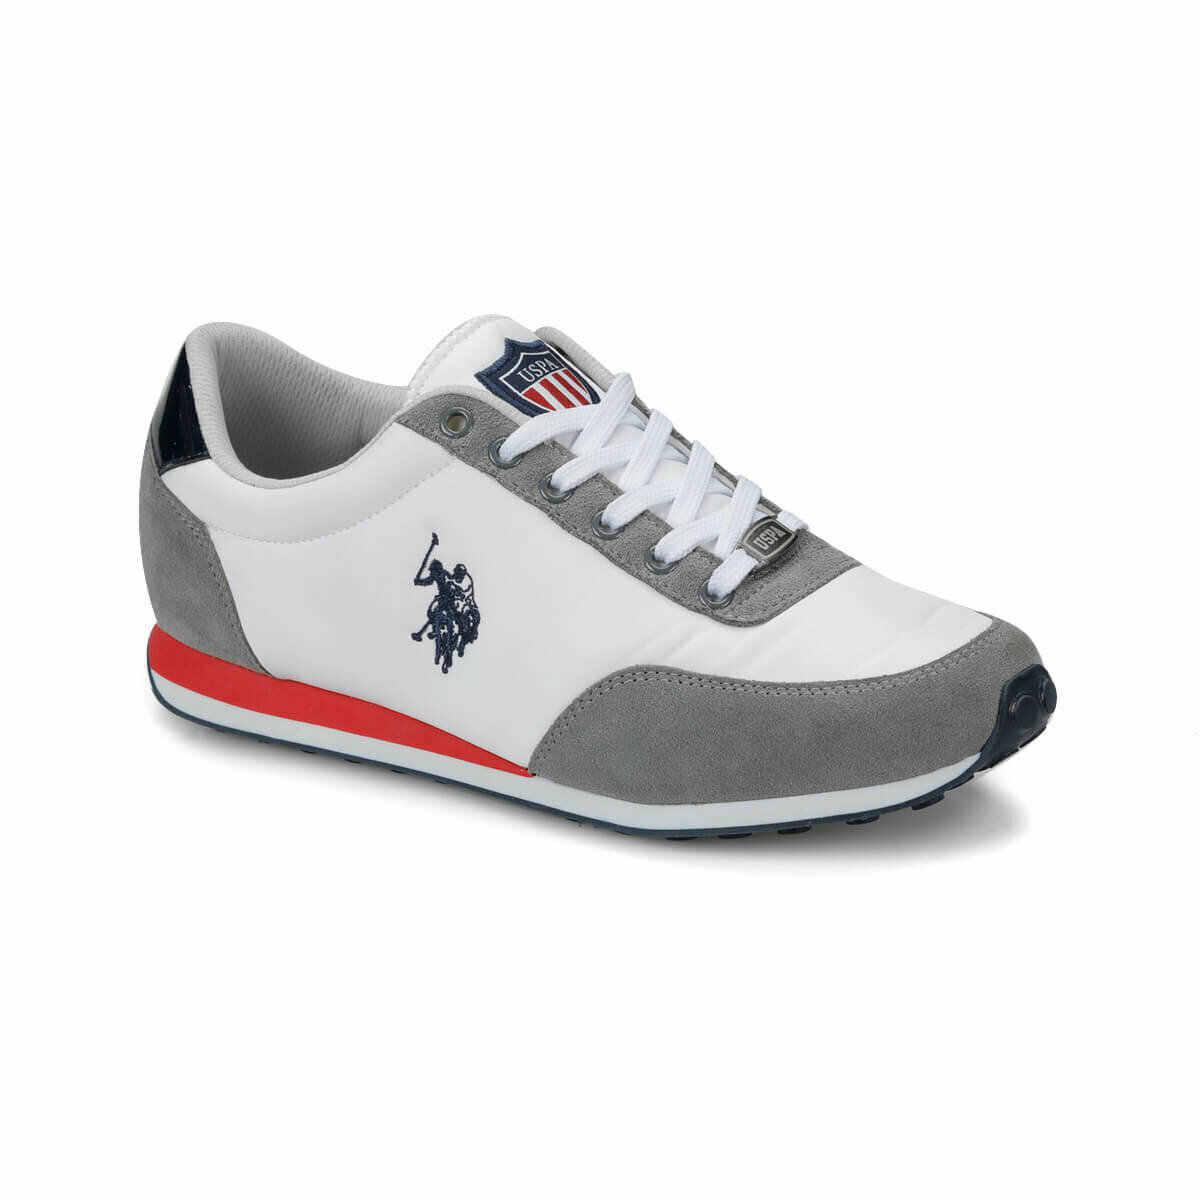 FLO PACIFIC White Men 'S Sneaker Shoes